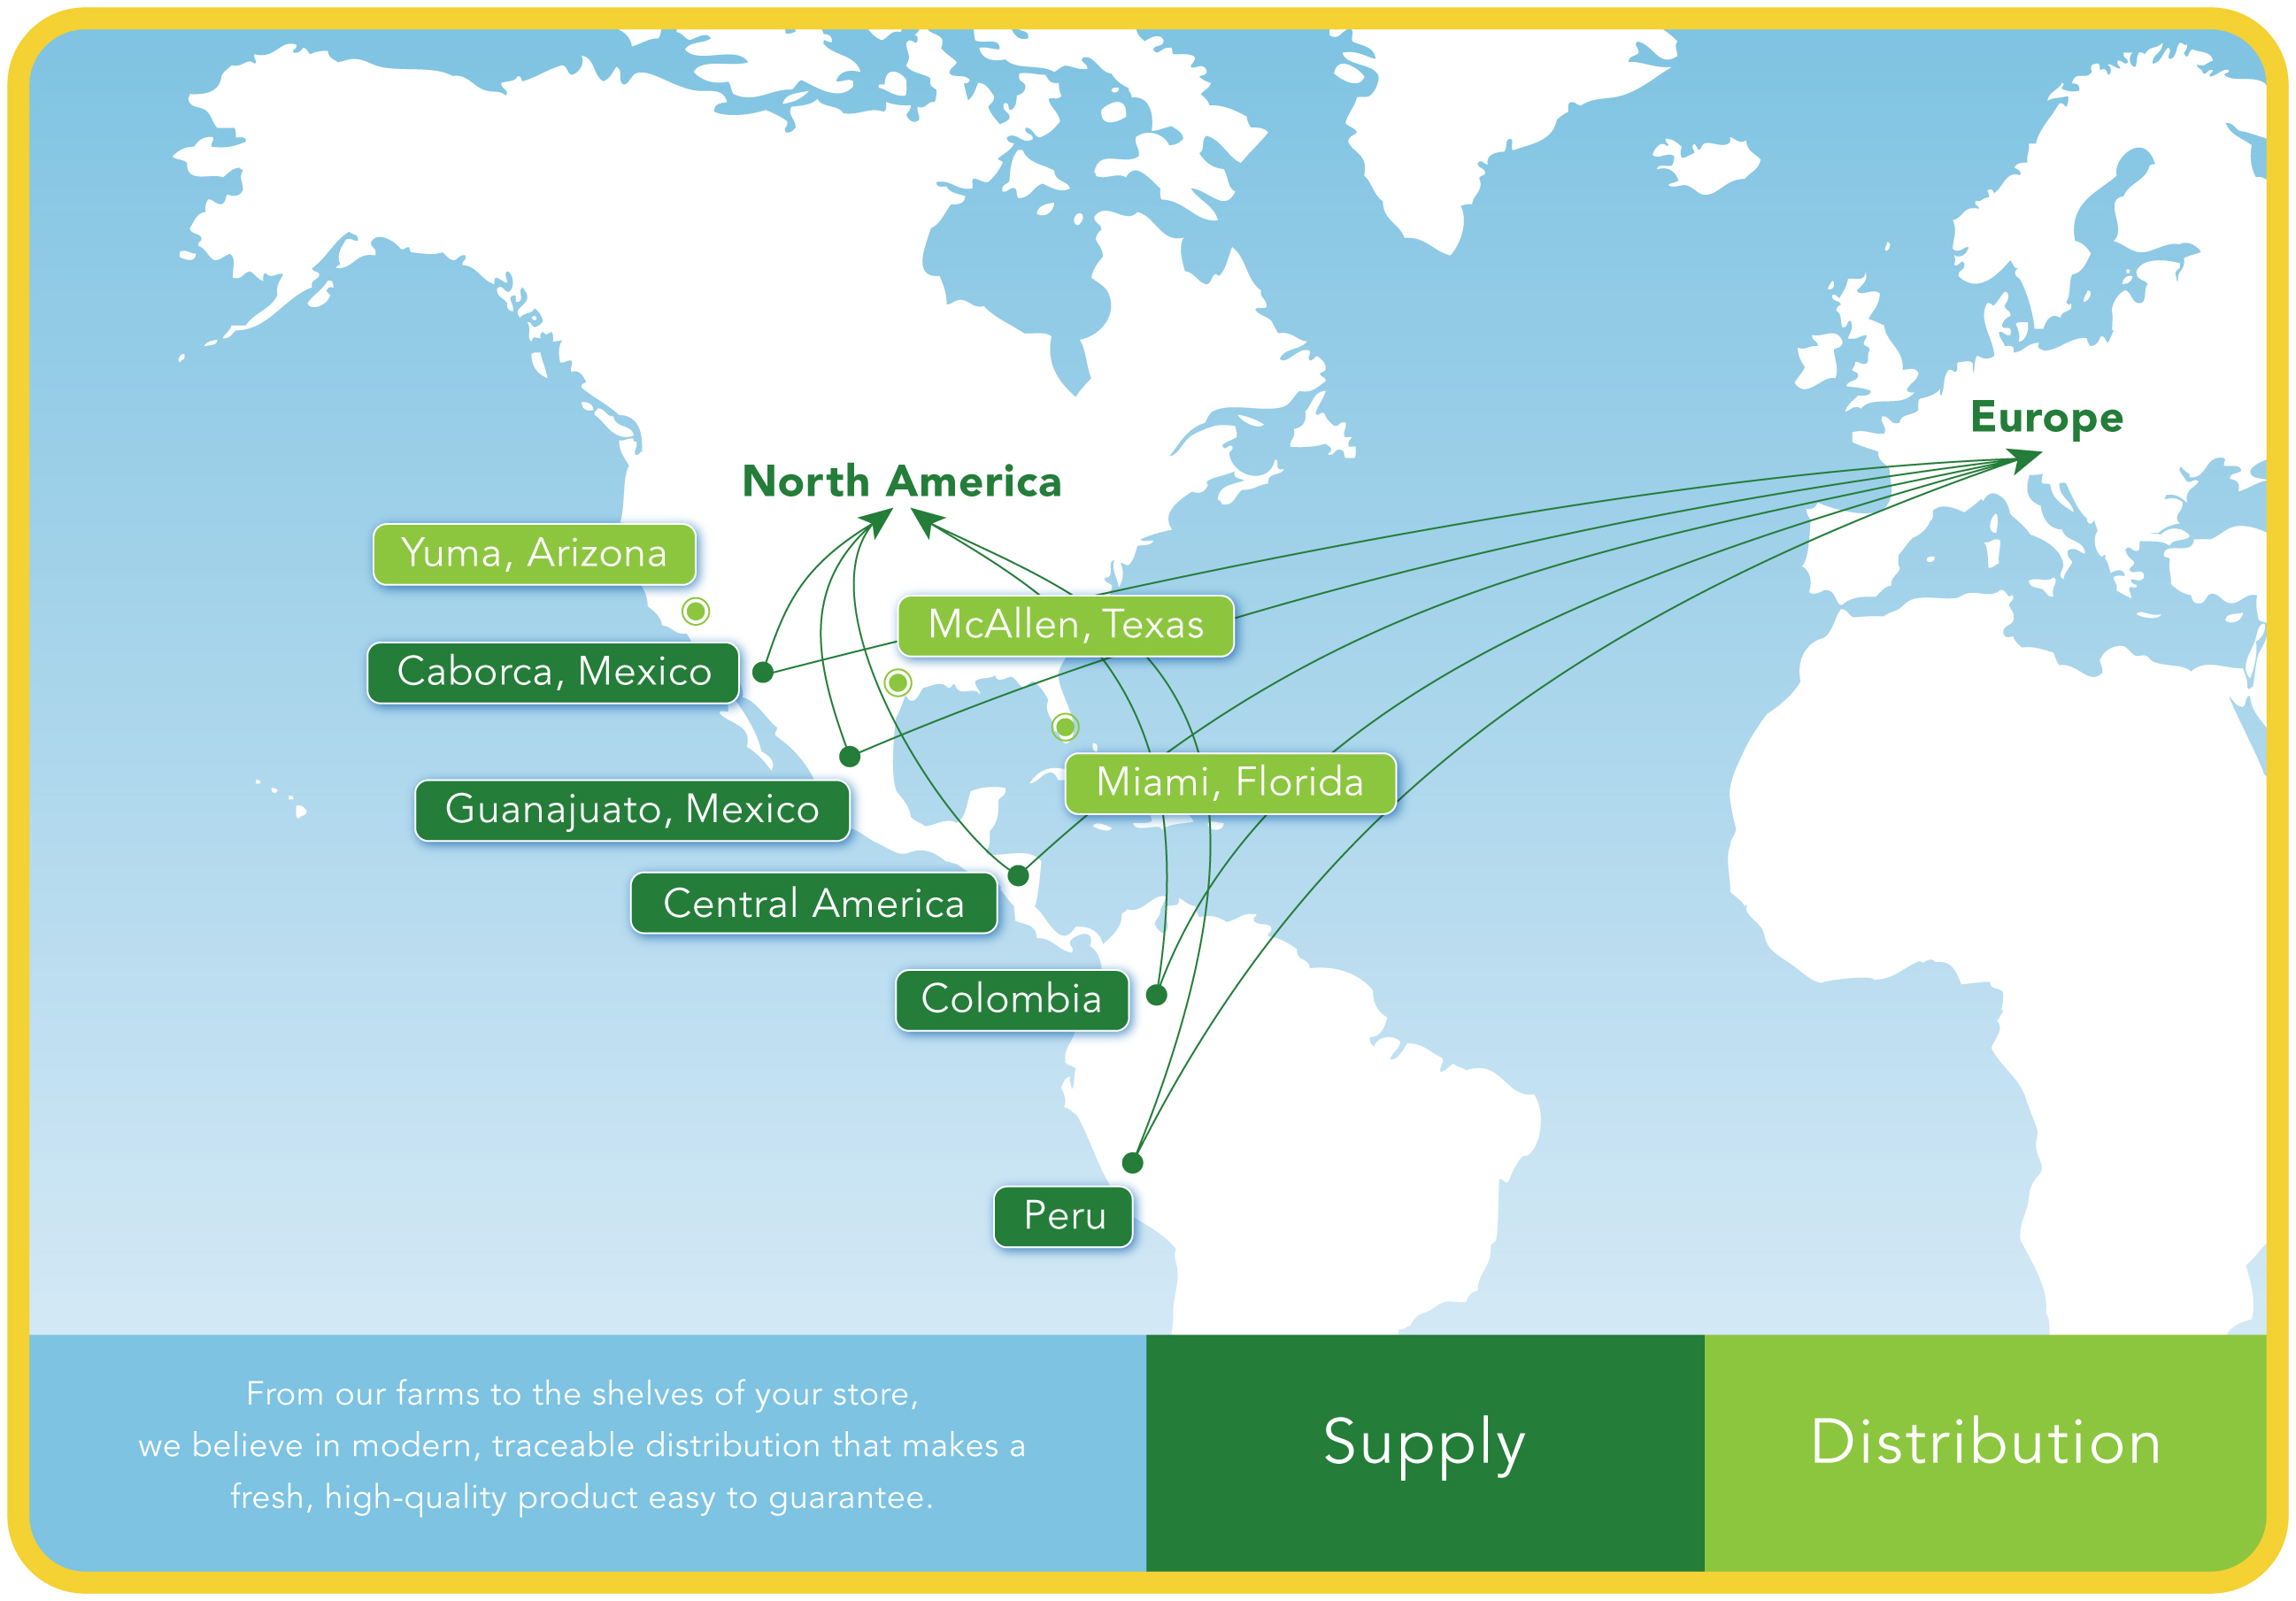 Map Supply & Distribution